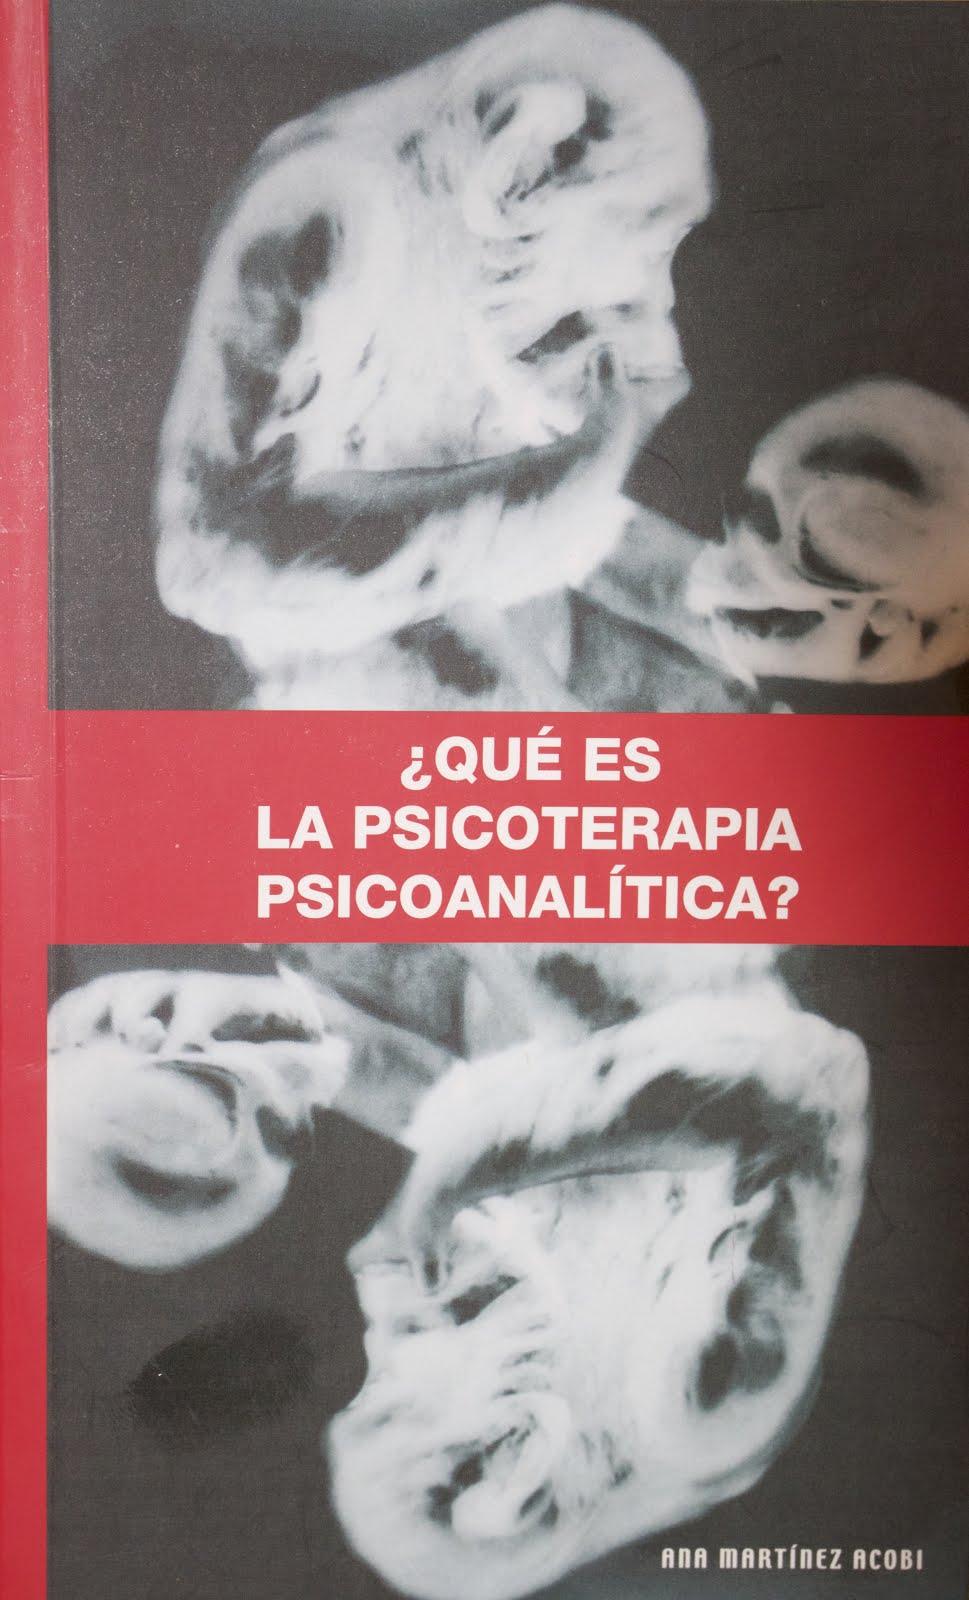 Ana Martínez Acobi´s Book